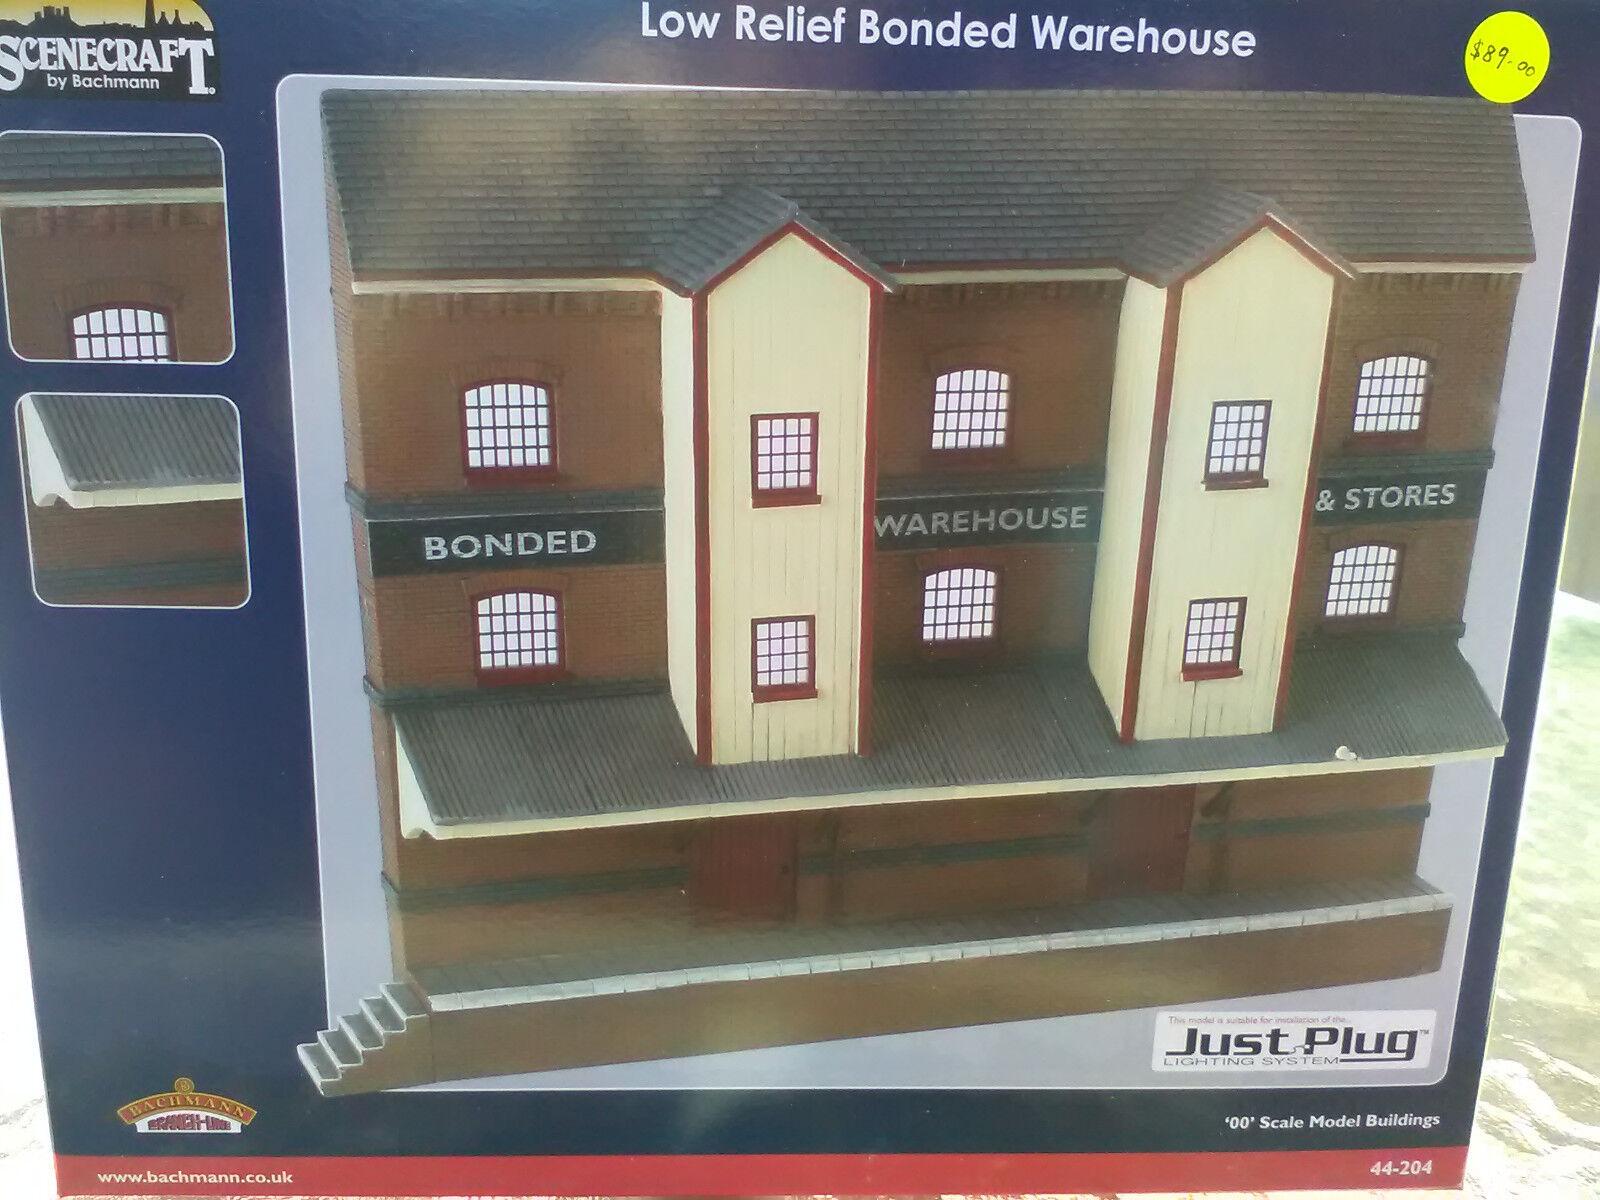 Bachmann Scenocraft låg Relief Bonded Warehouse OO gauge ref 44 -204